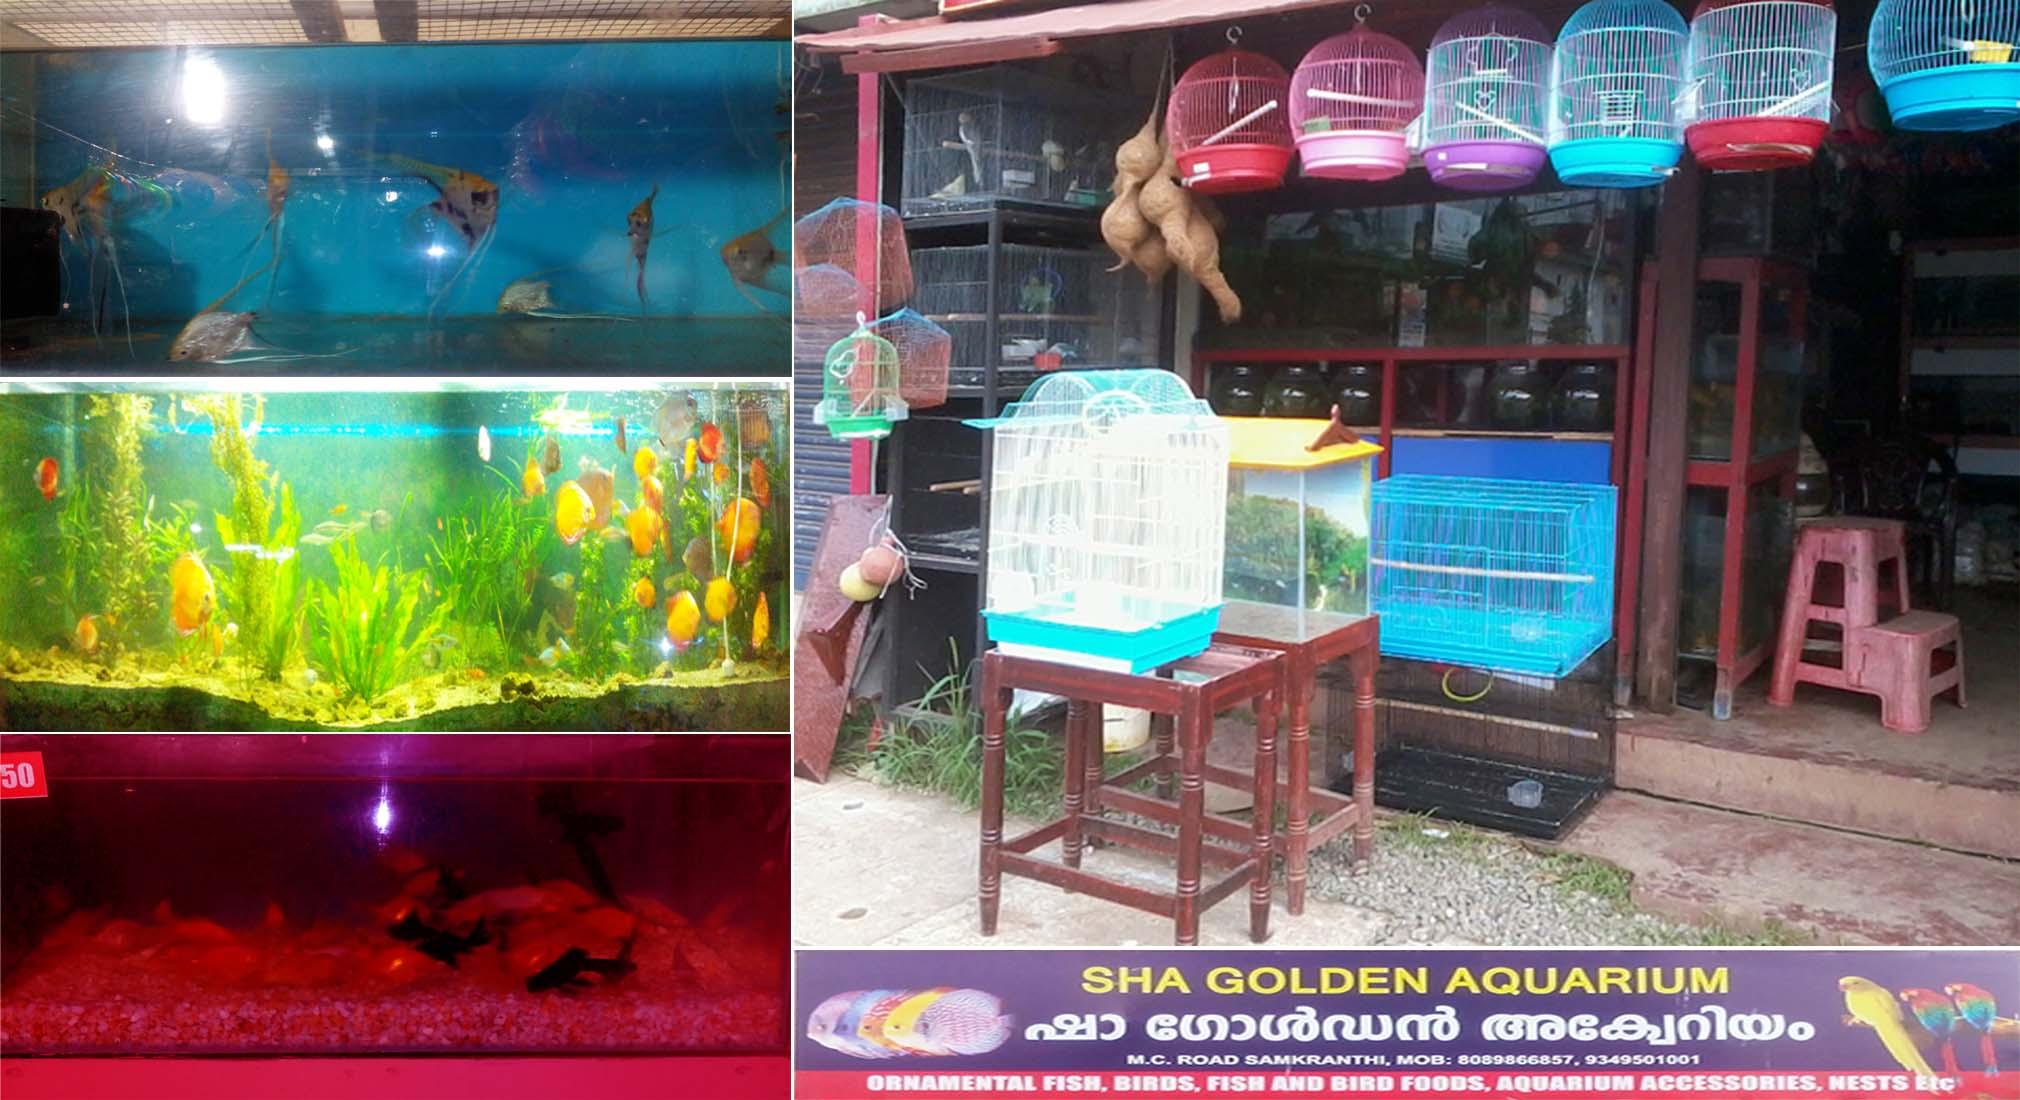 Fish Aquarium In Coimbatore - Sha golden aquarium fishes and lovebirds shop in kottayam sankranthi kerala